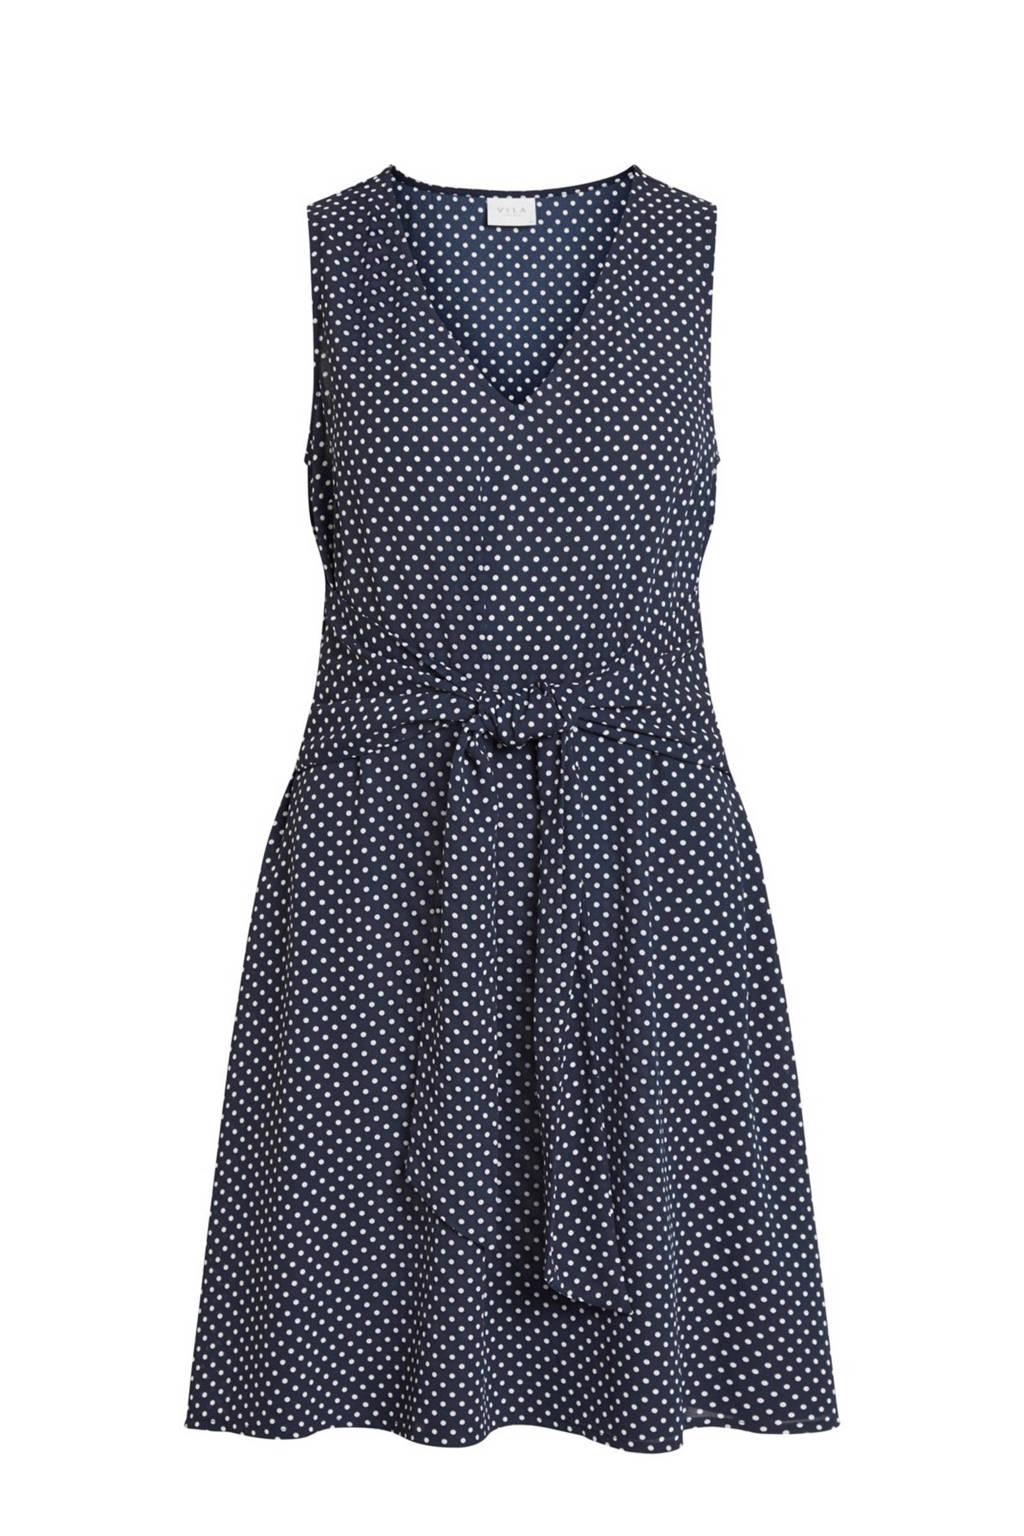 b37b39e5fe39e0 VILA mouwloze jurk met strikdetail